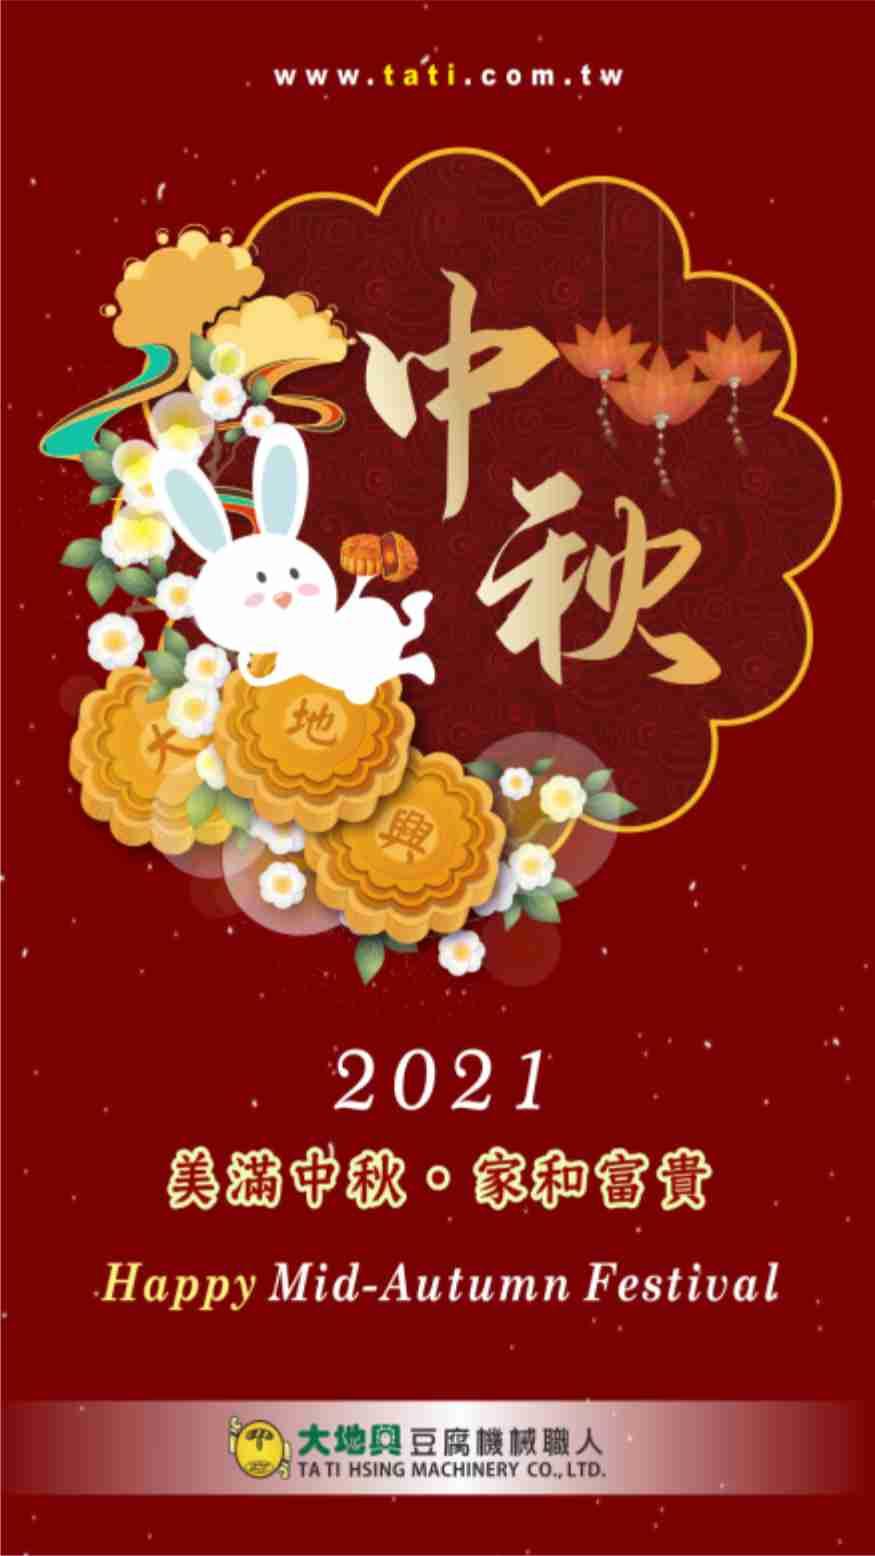 proimages/2021_NEW/2021_中秋節.jpg